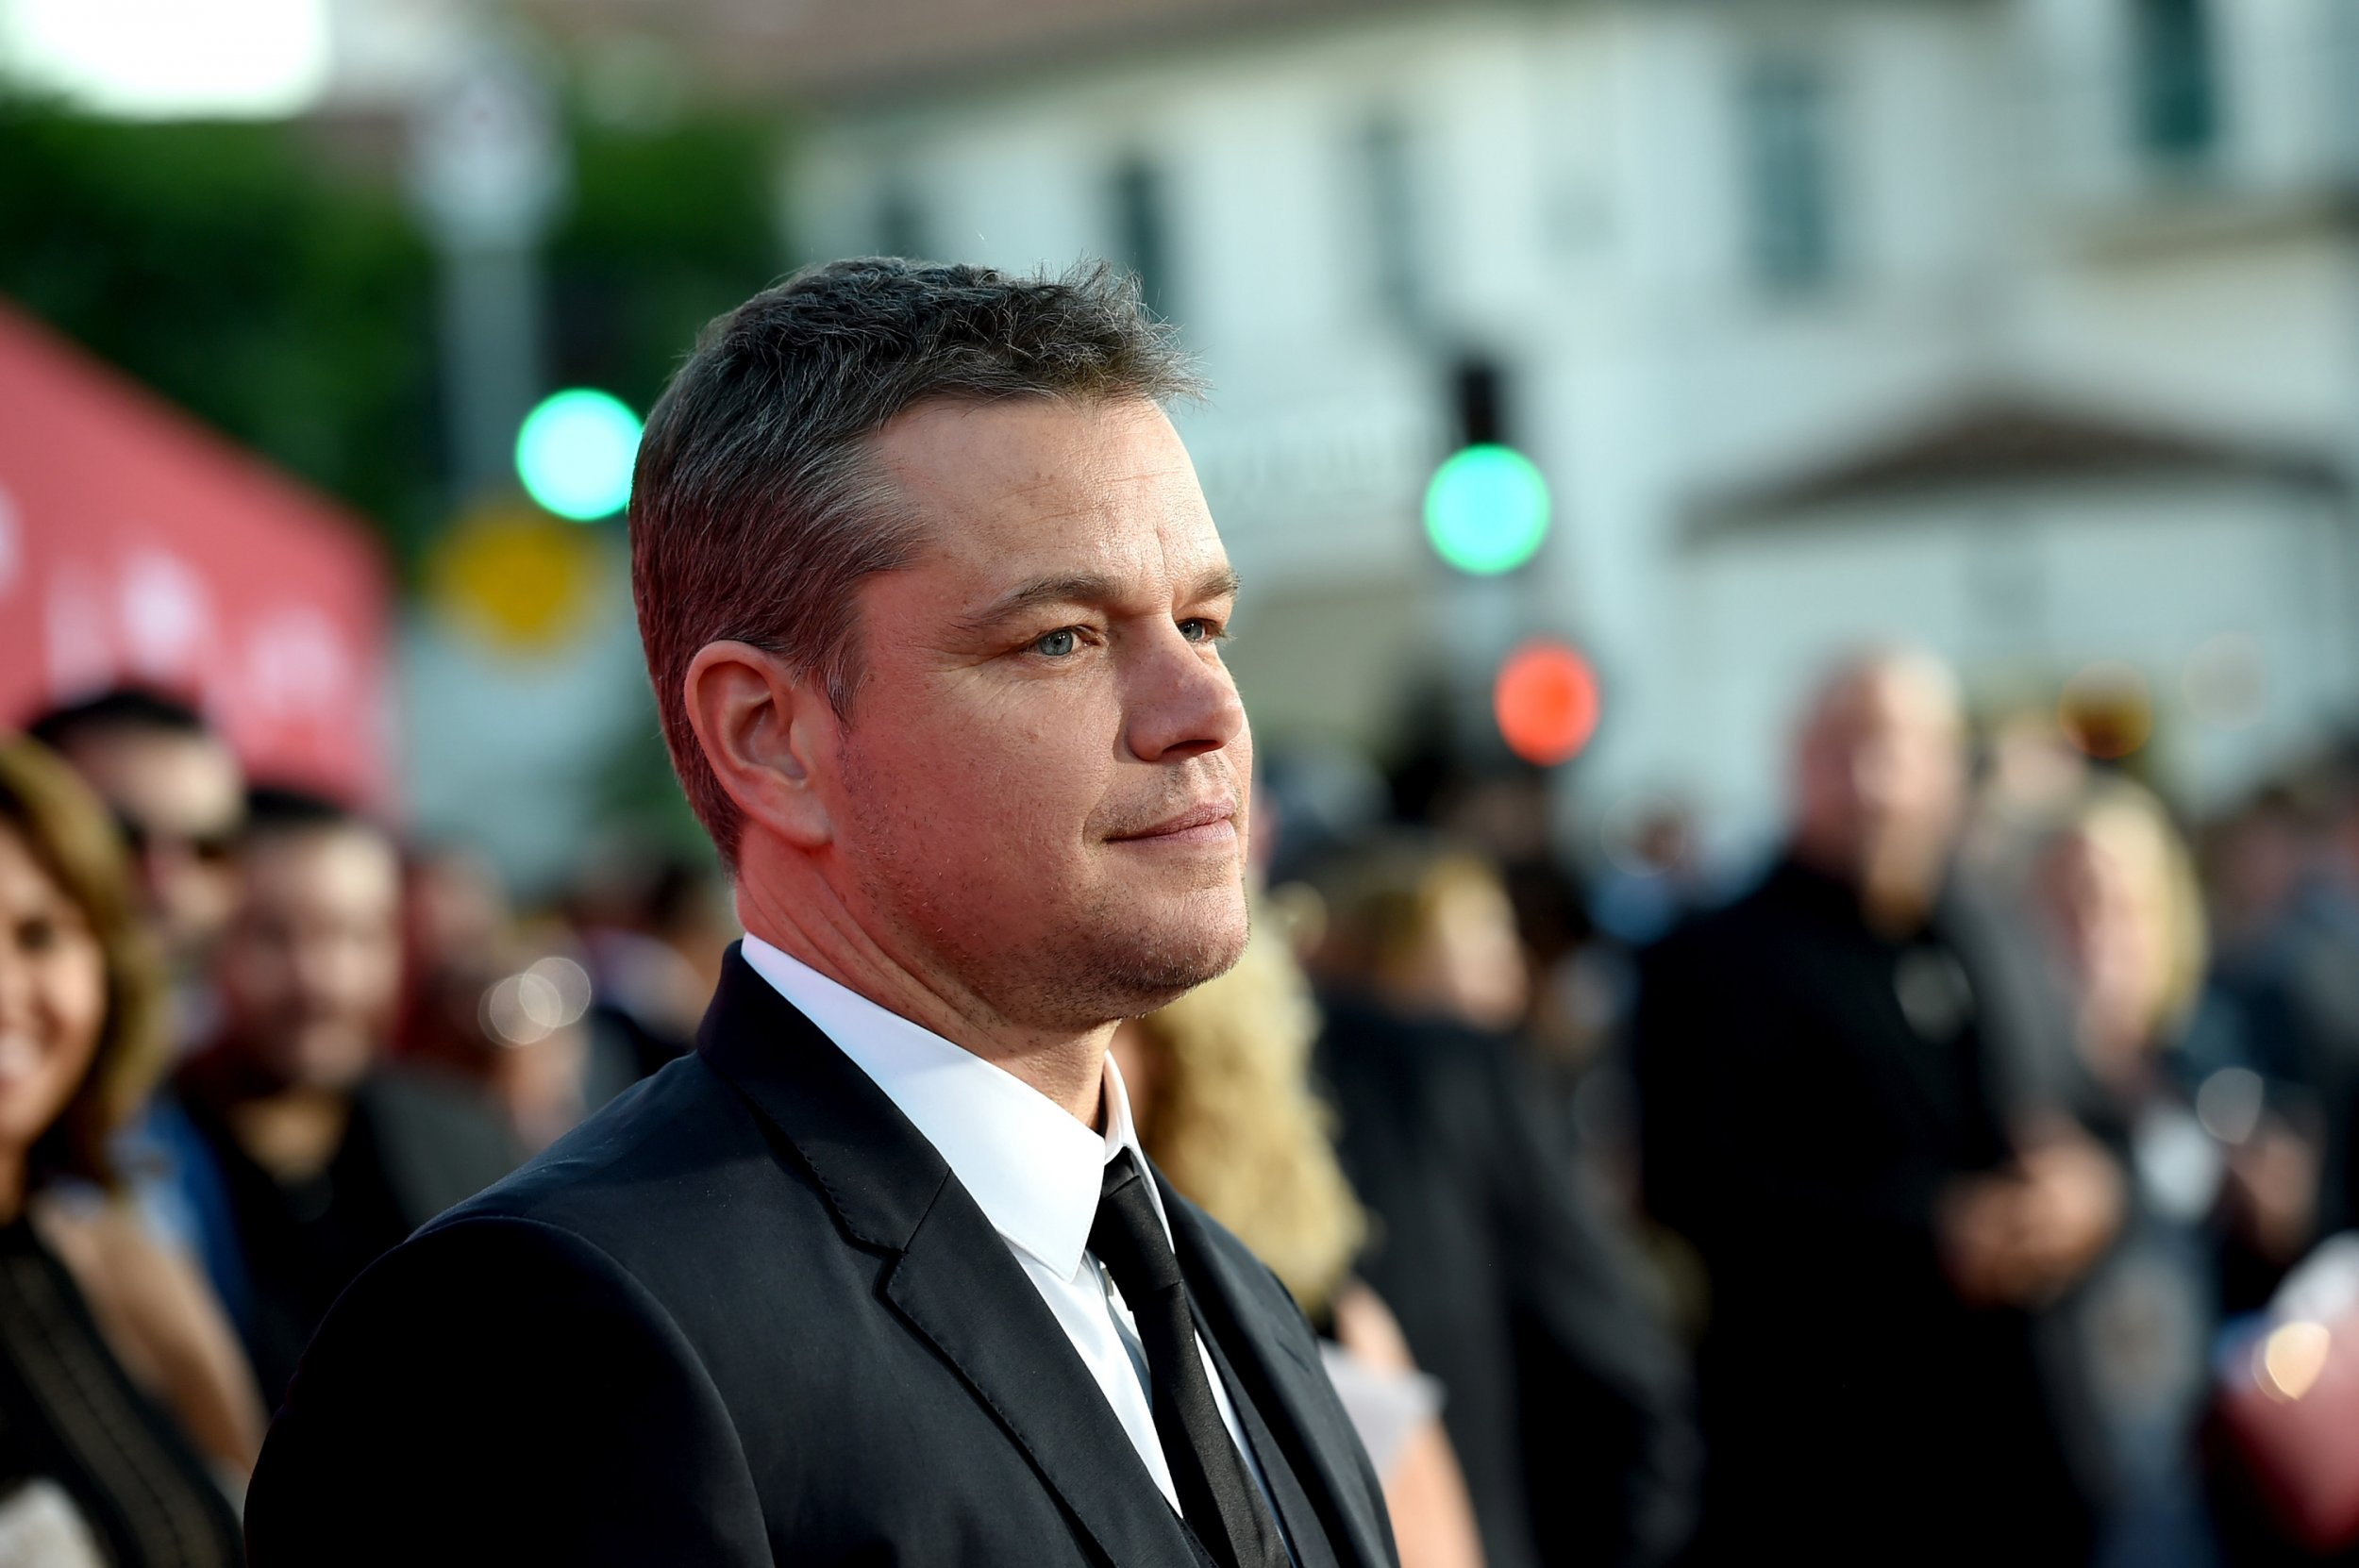 Matt Damon wants people to talk about non-sexual harassers